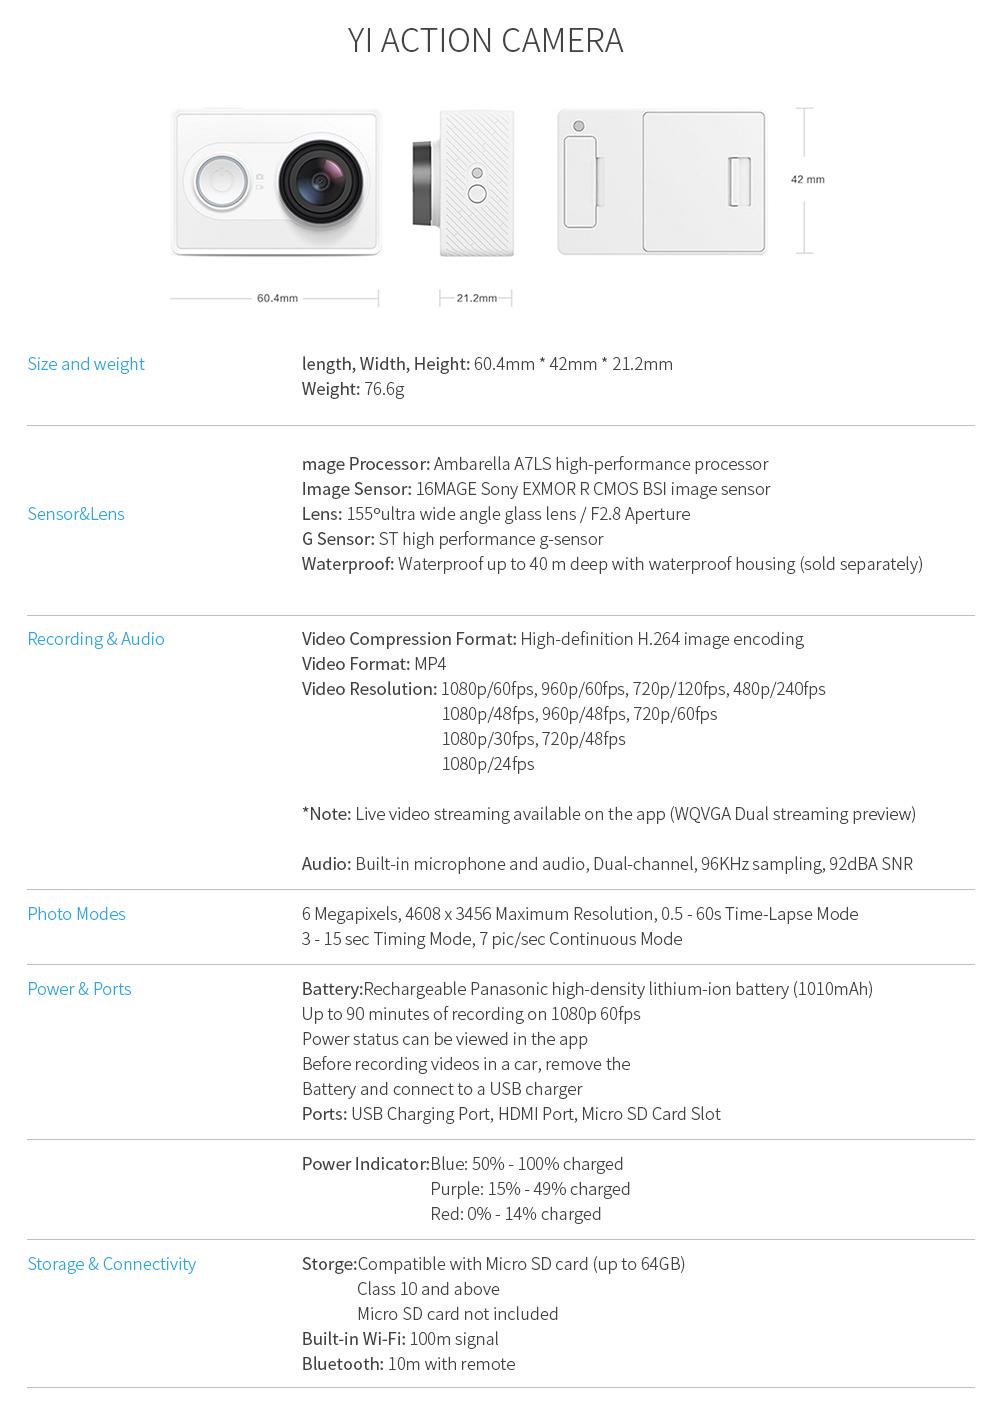 YI Action Camera 1080P Lime Green White Black 16MP Full HD 155 degree Ultra-wide Angle Sports Mini Camera 11